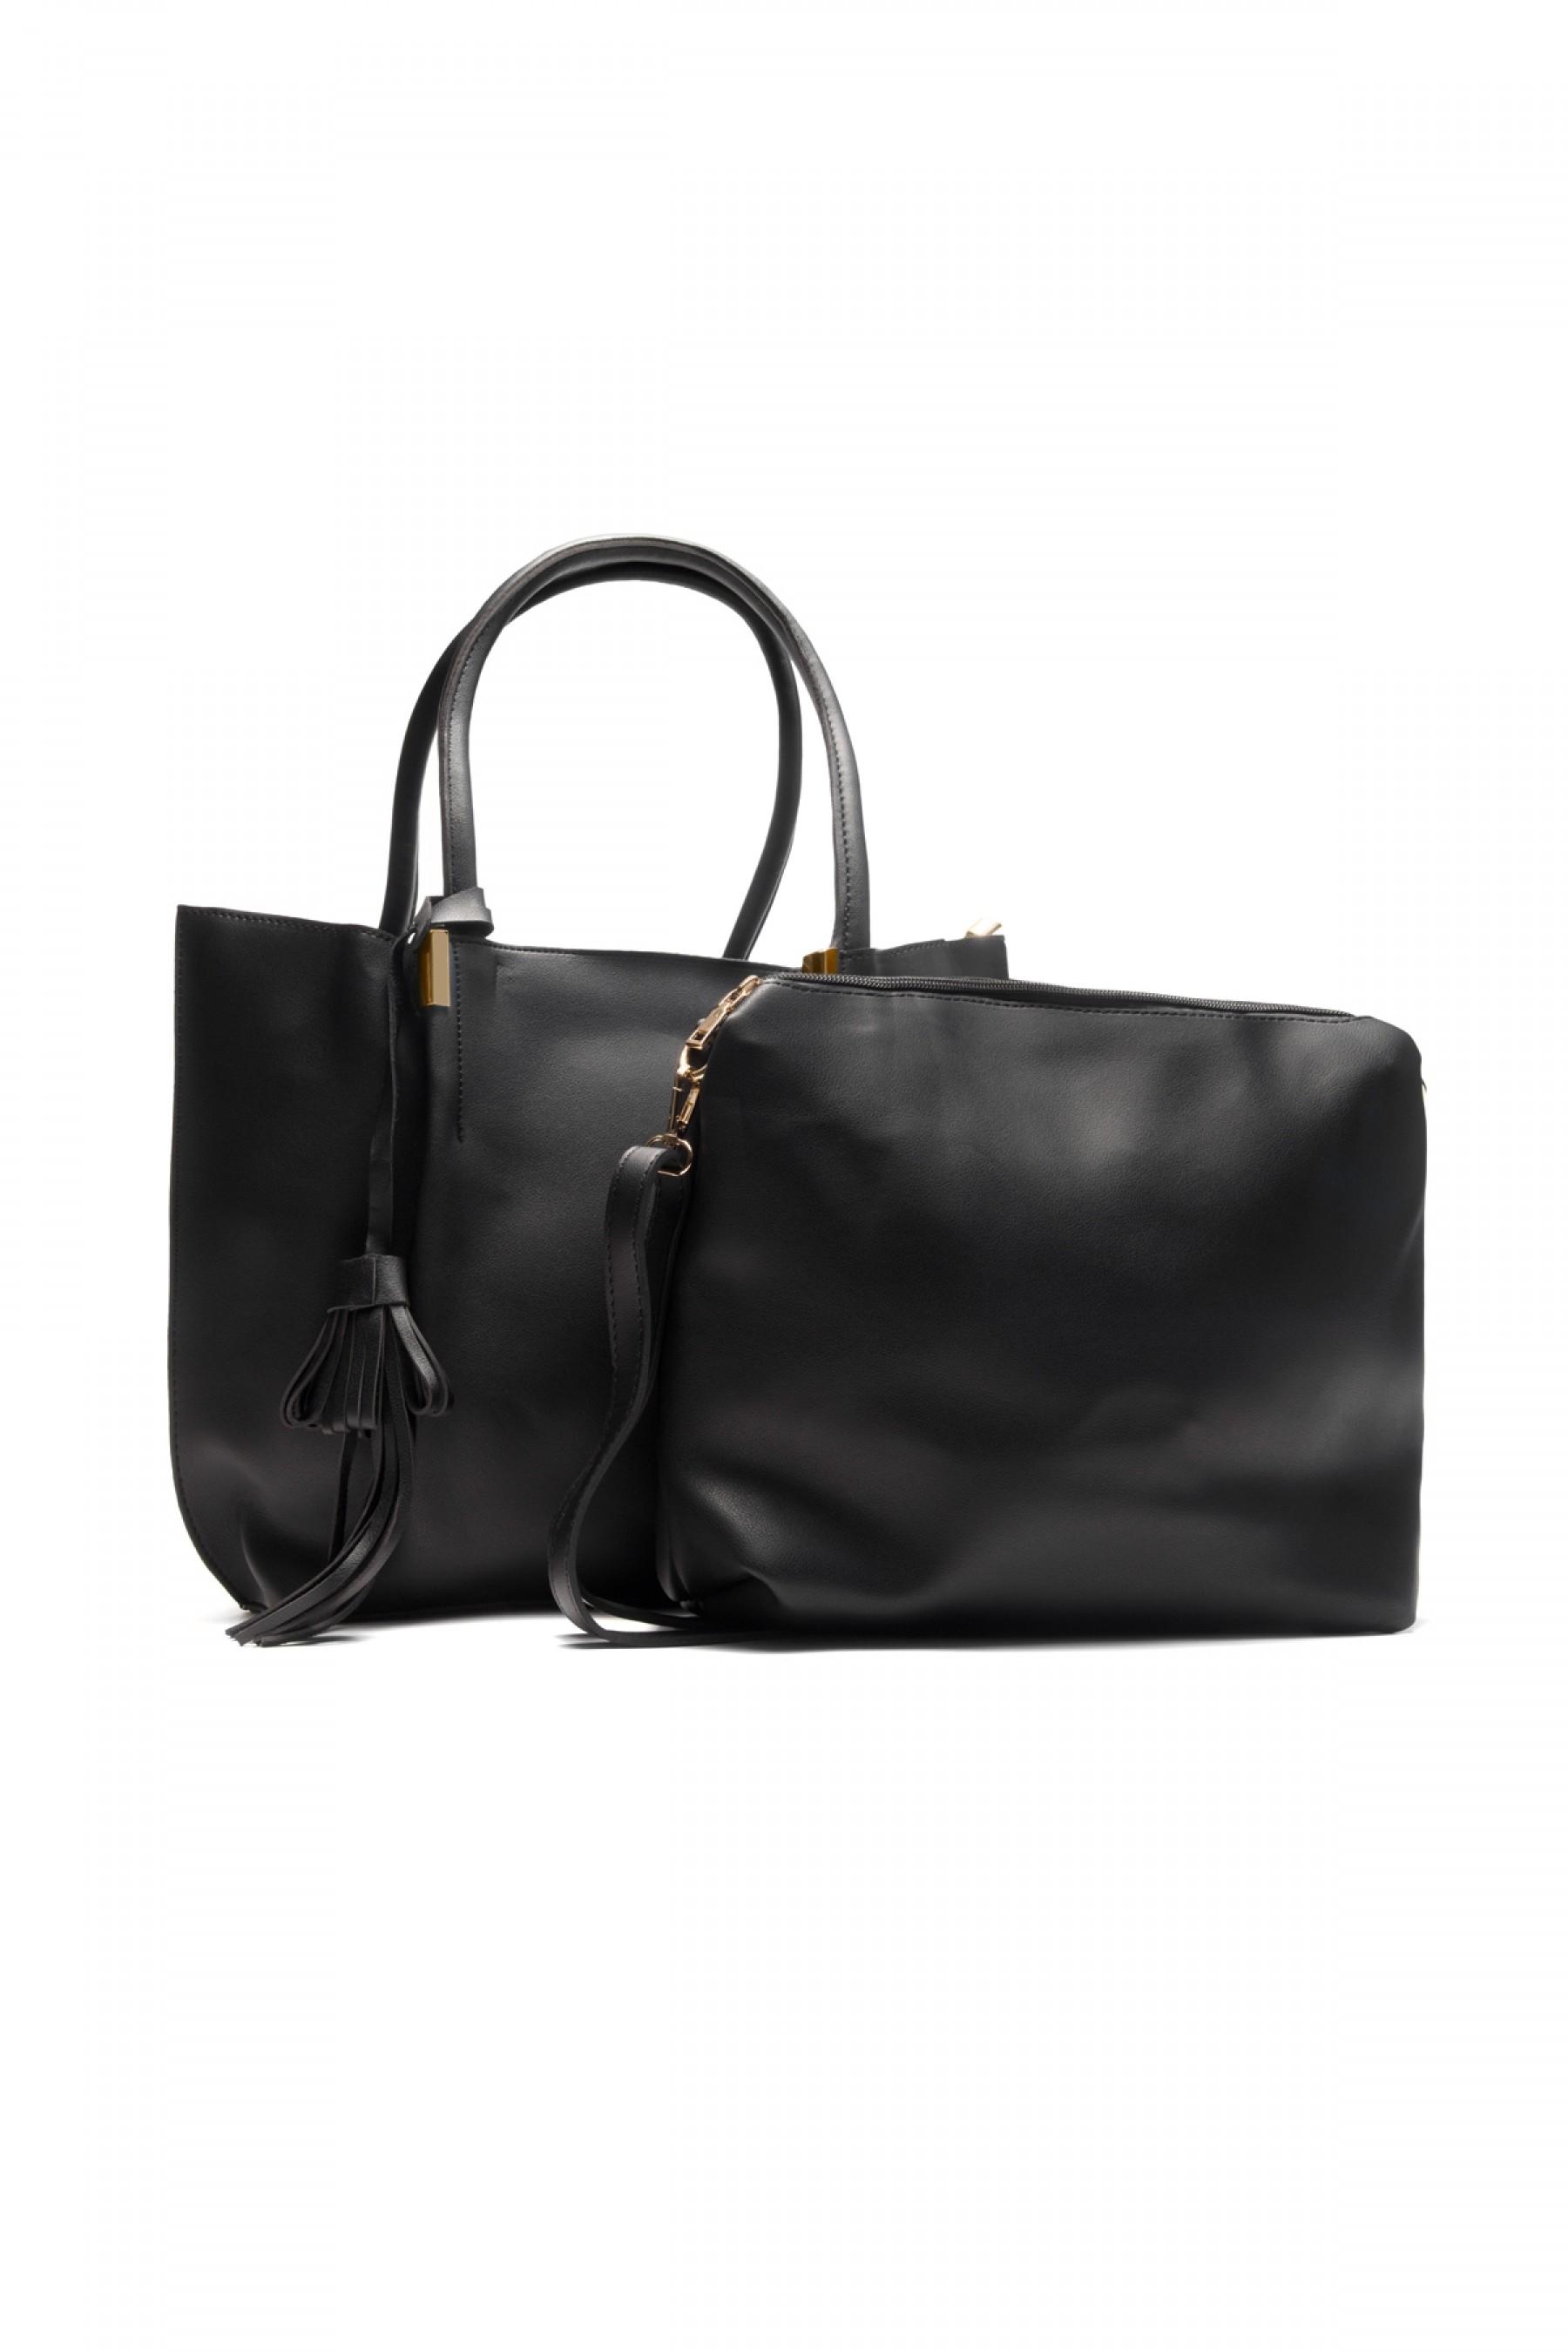 SYL-6096- Large Tassel Fashion Tote With Matching Bag (Black)